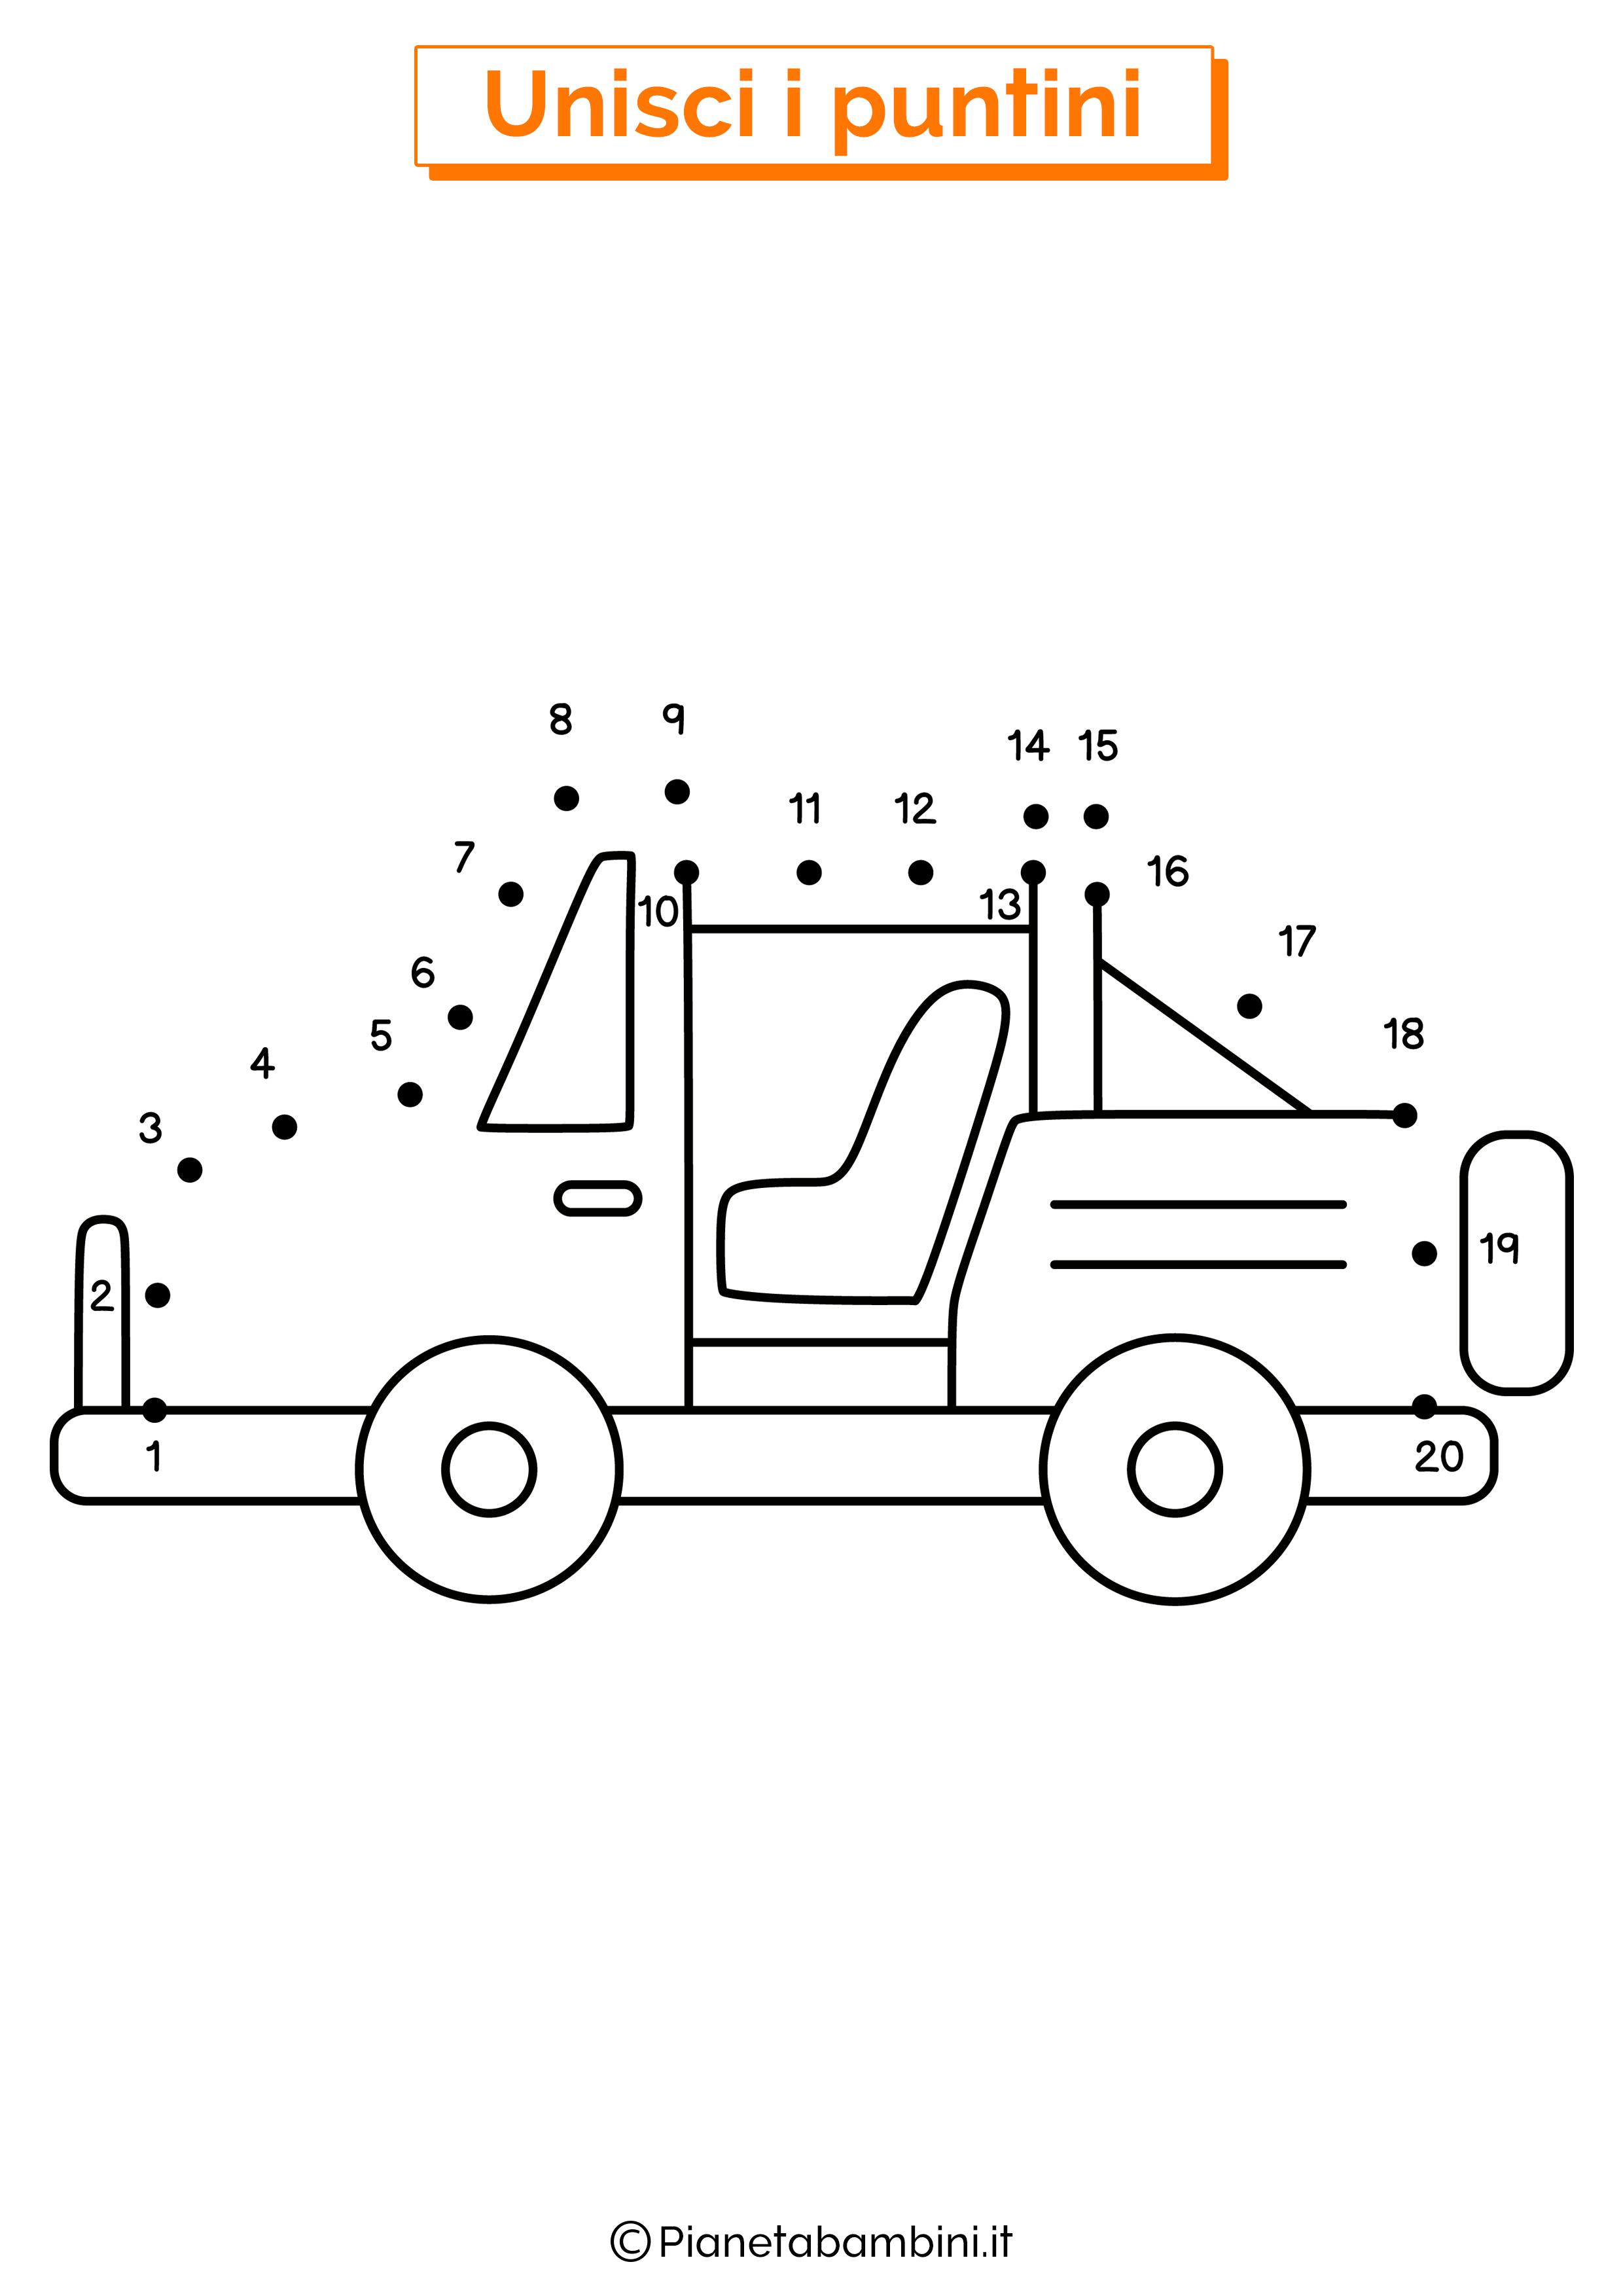 Disegno unisci i puntini jeep